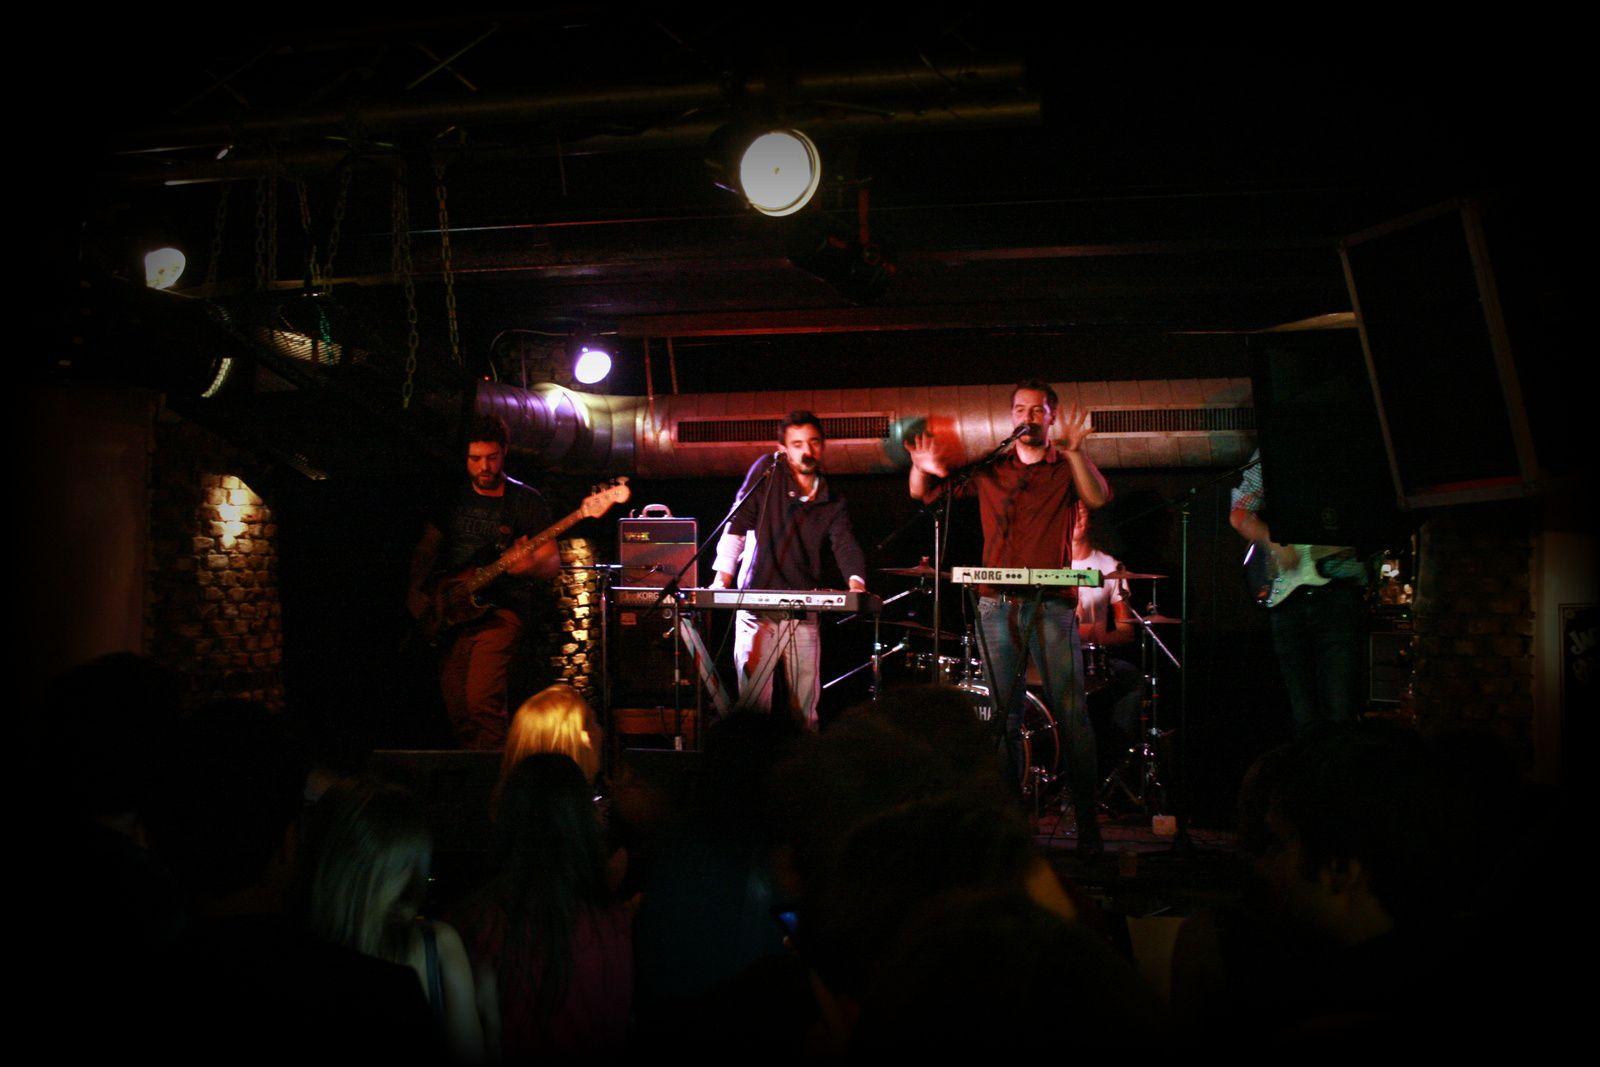 Ladylo @ Rock Classic - 23/10/2015